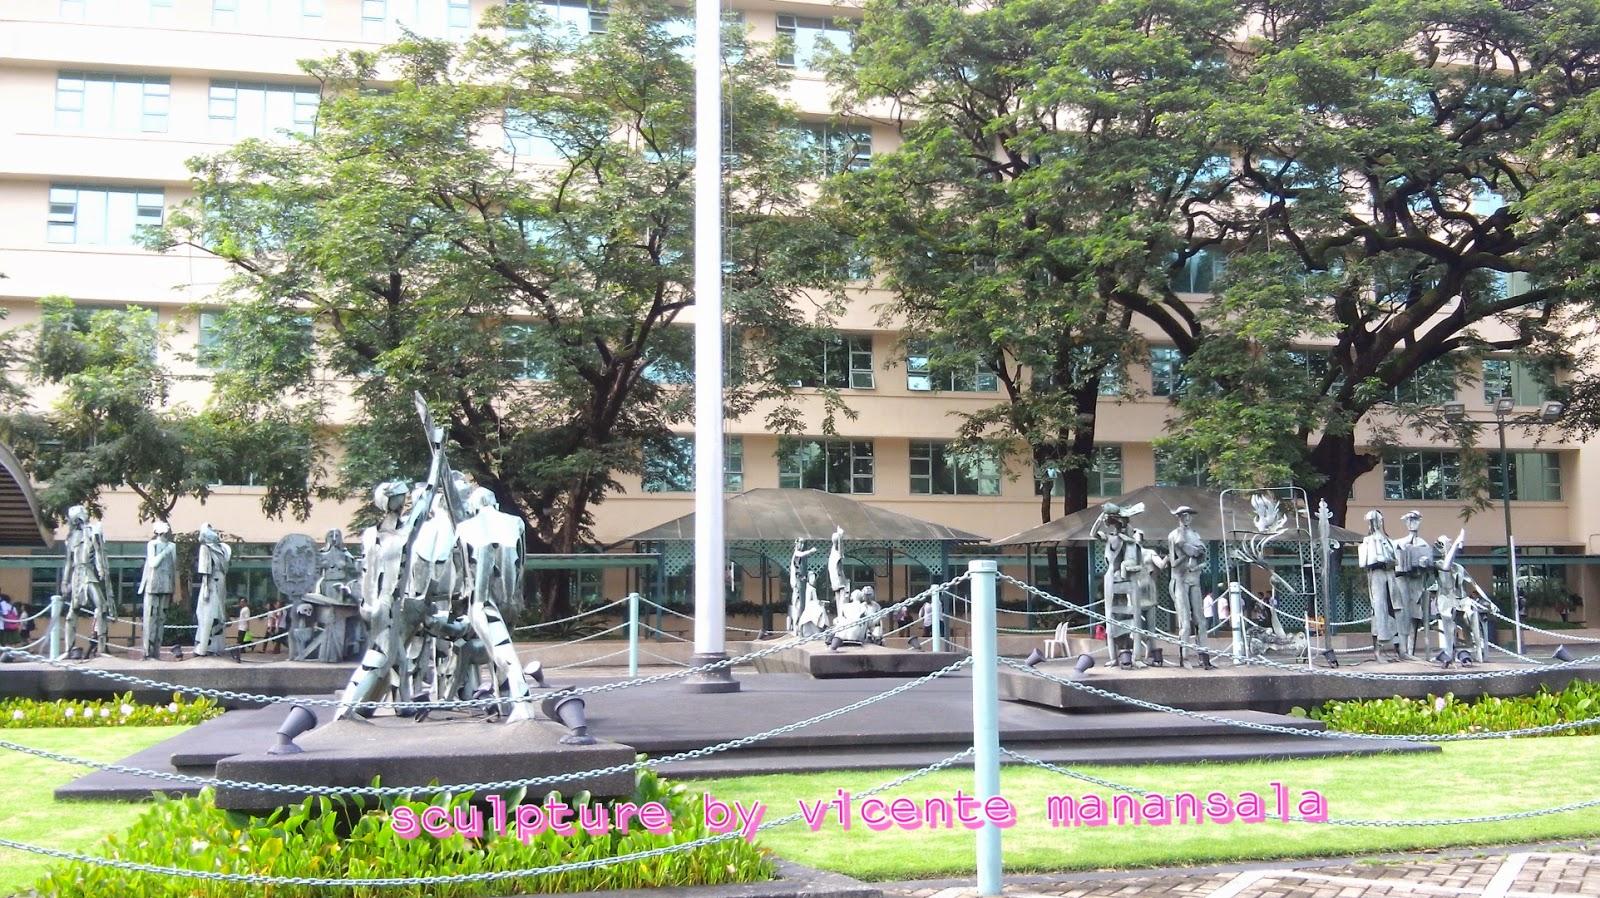 Sculpture by Vicente Manansala